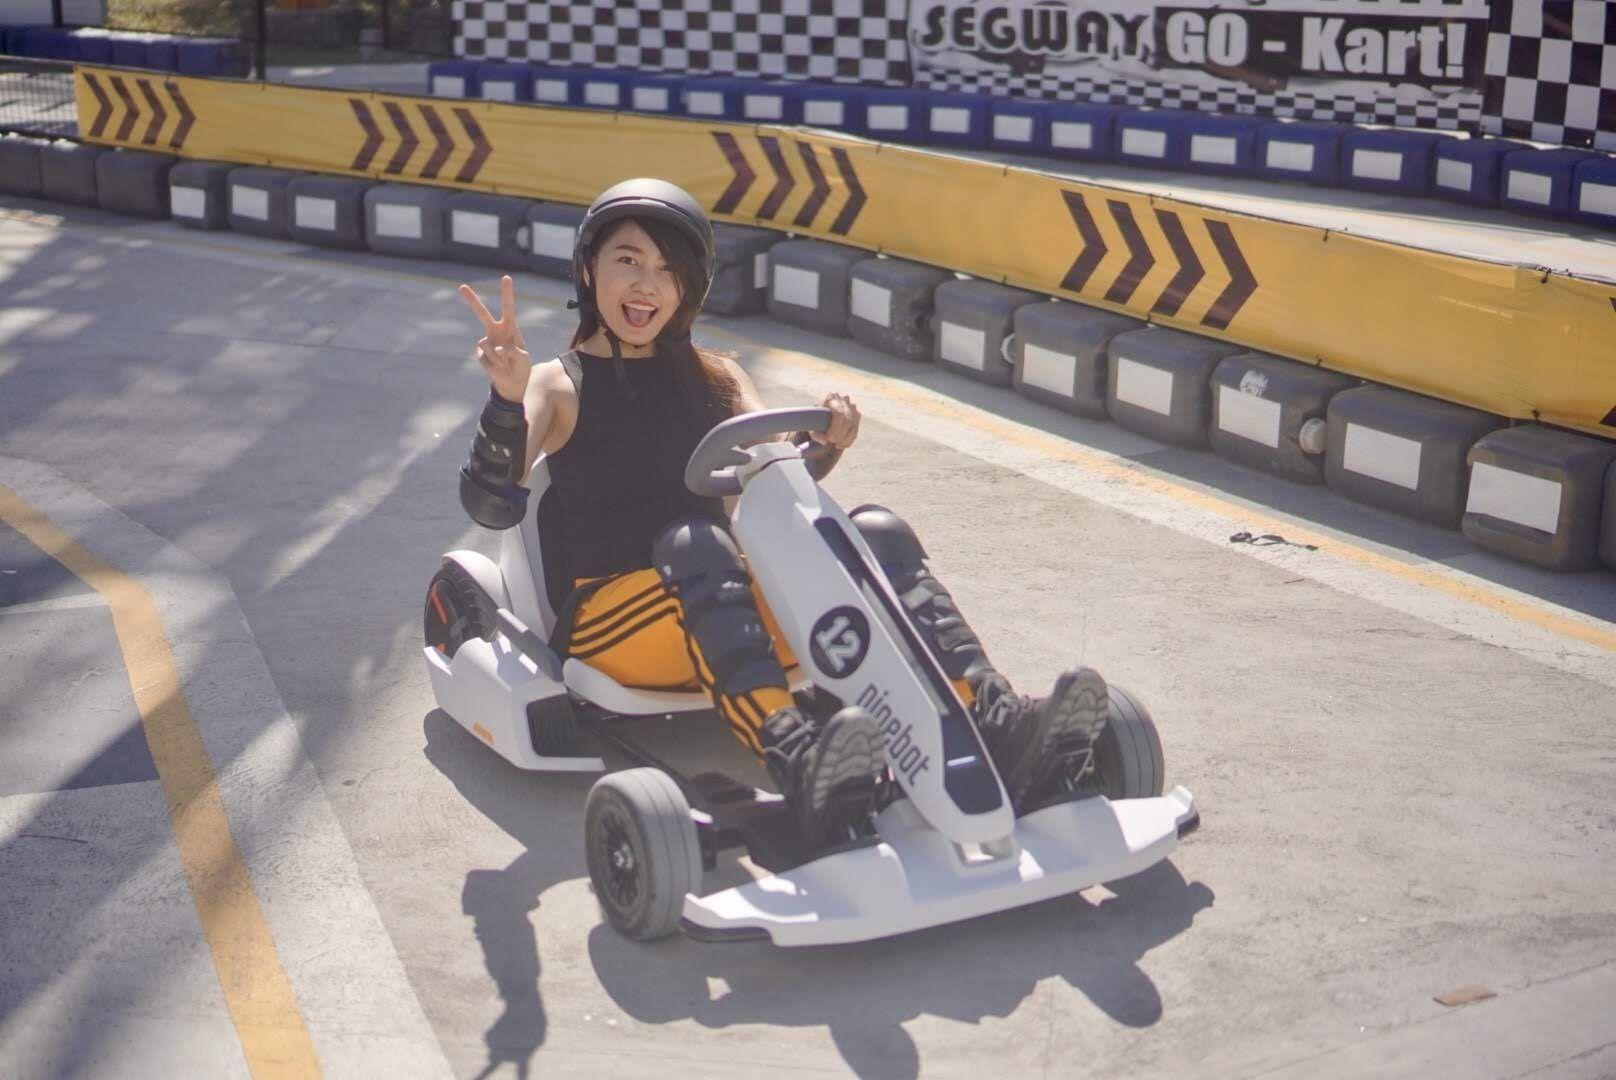 Segway Go Kart Racing At Adventure Zone Star City Go Kart Racing Fashion Lifestyle Blog Kart Racing